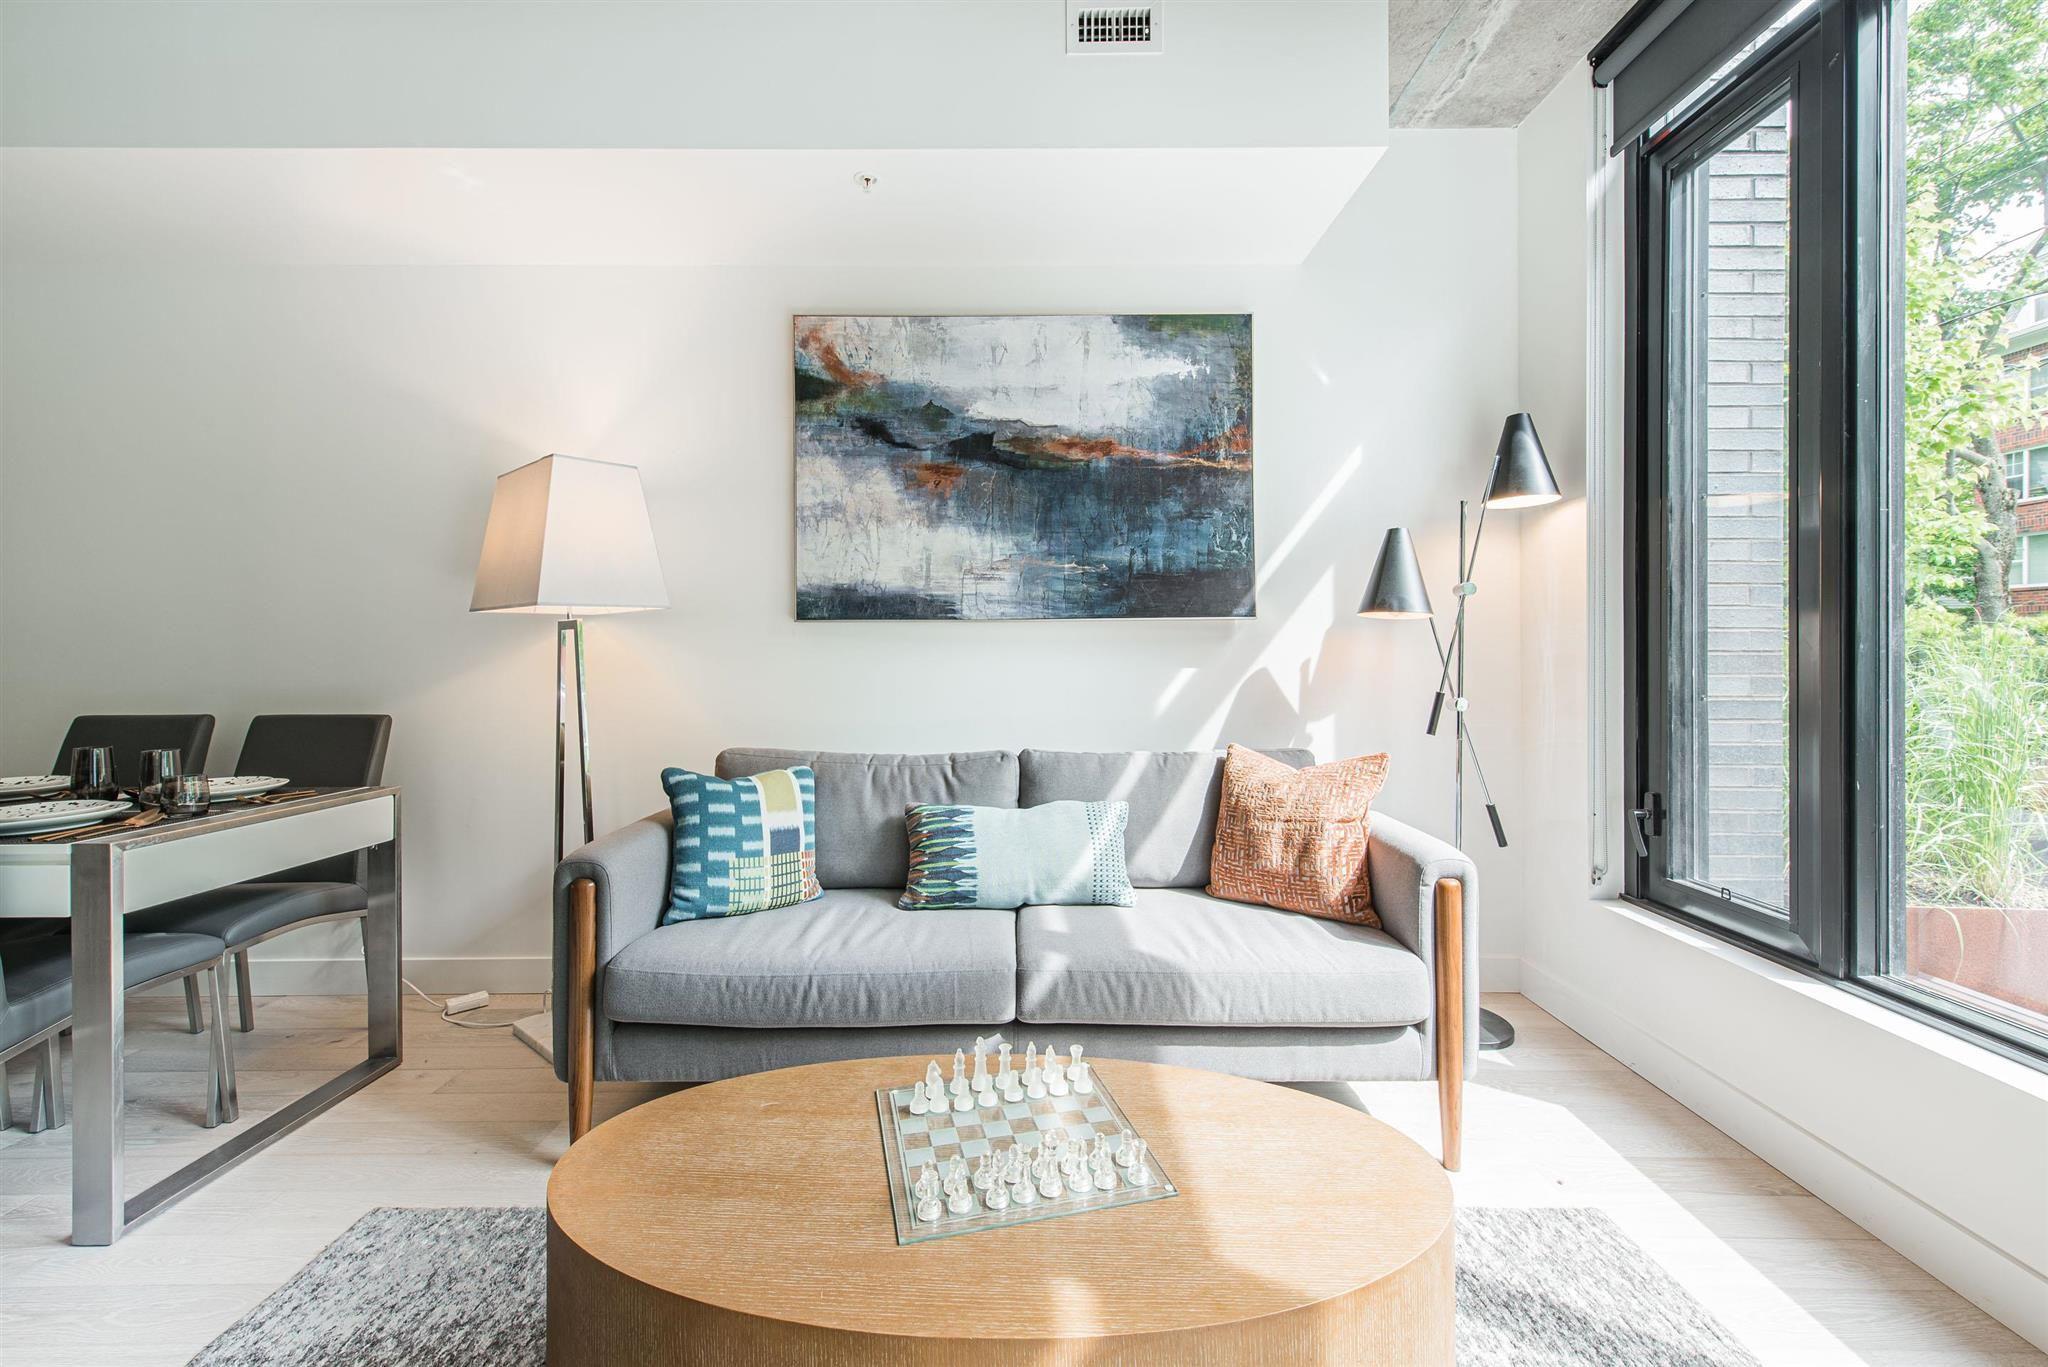 Photo 8: Photos: 105 1048 Wellington Street in Halifax: 2-Halifax South Residential for sale (Halifax-Dartmouth)  : MLS®# 202100816